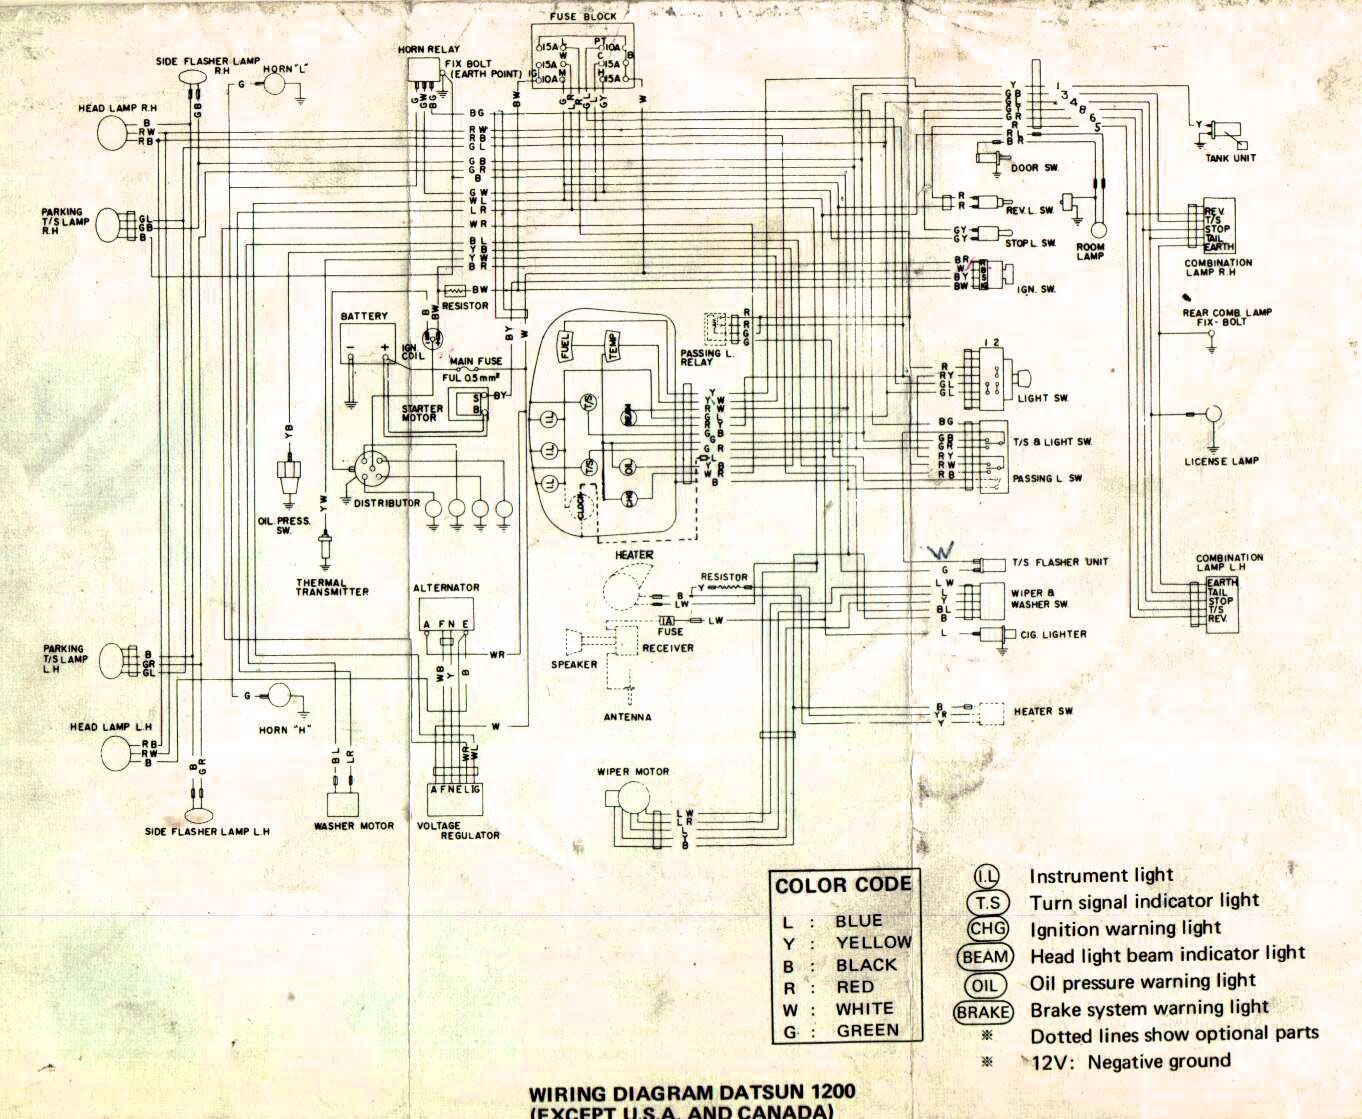 hight resolution of nissan 1400 wiring diagram wiring diagram dat nissan 1400 coil wiring diagram nissan 1400 wiring diagram